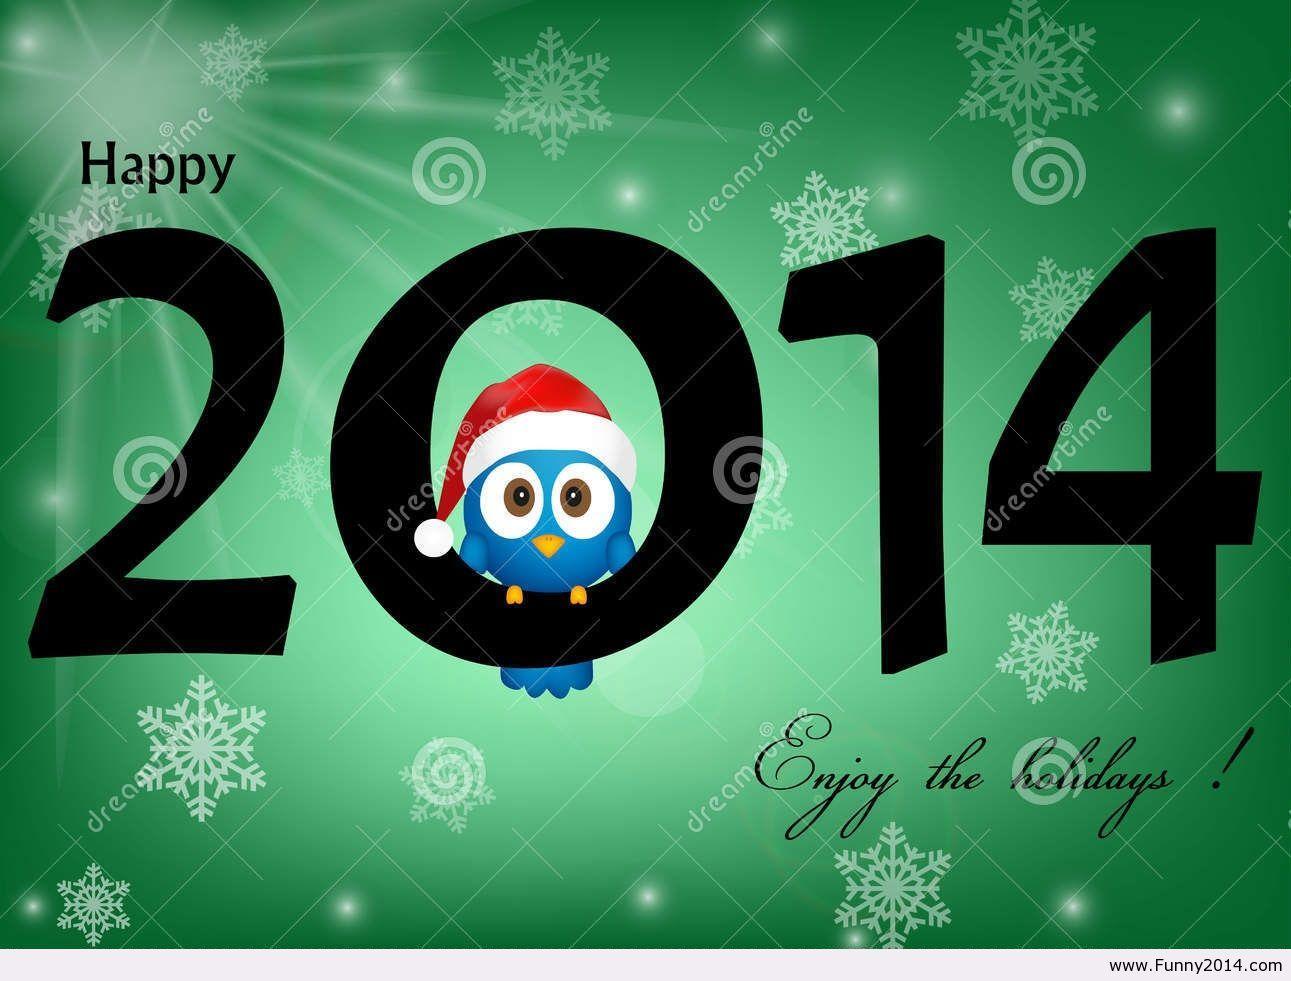 Happy 2014 free wallpaper